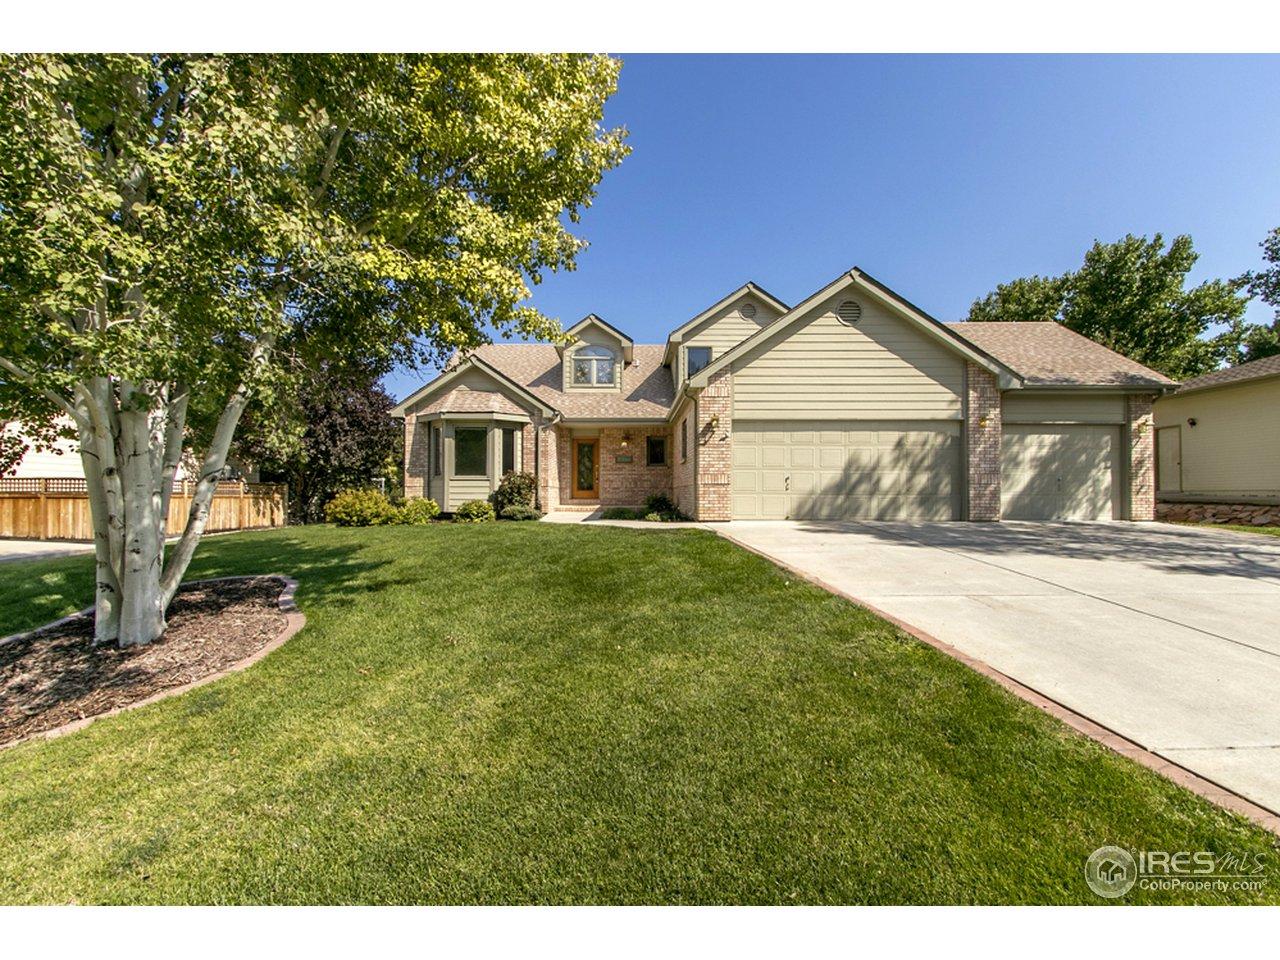 741 Knollwood Cir, Fort Collins CO 80524